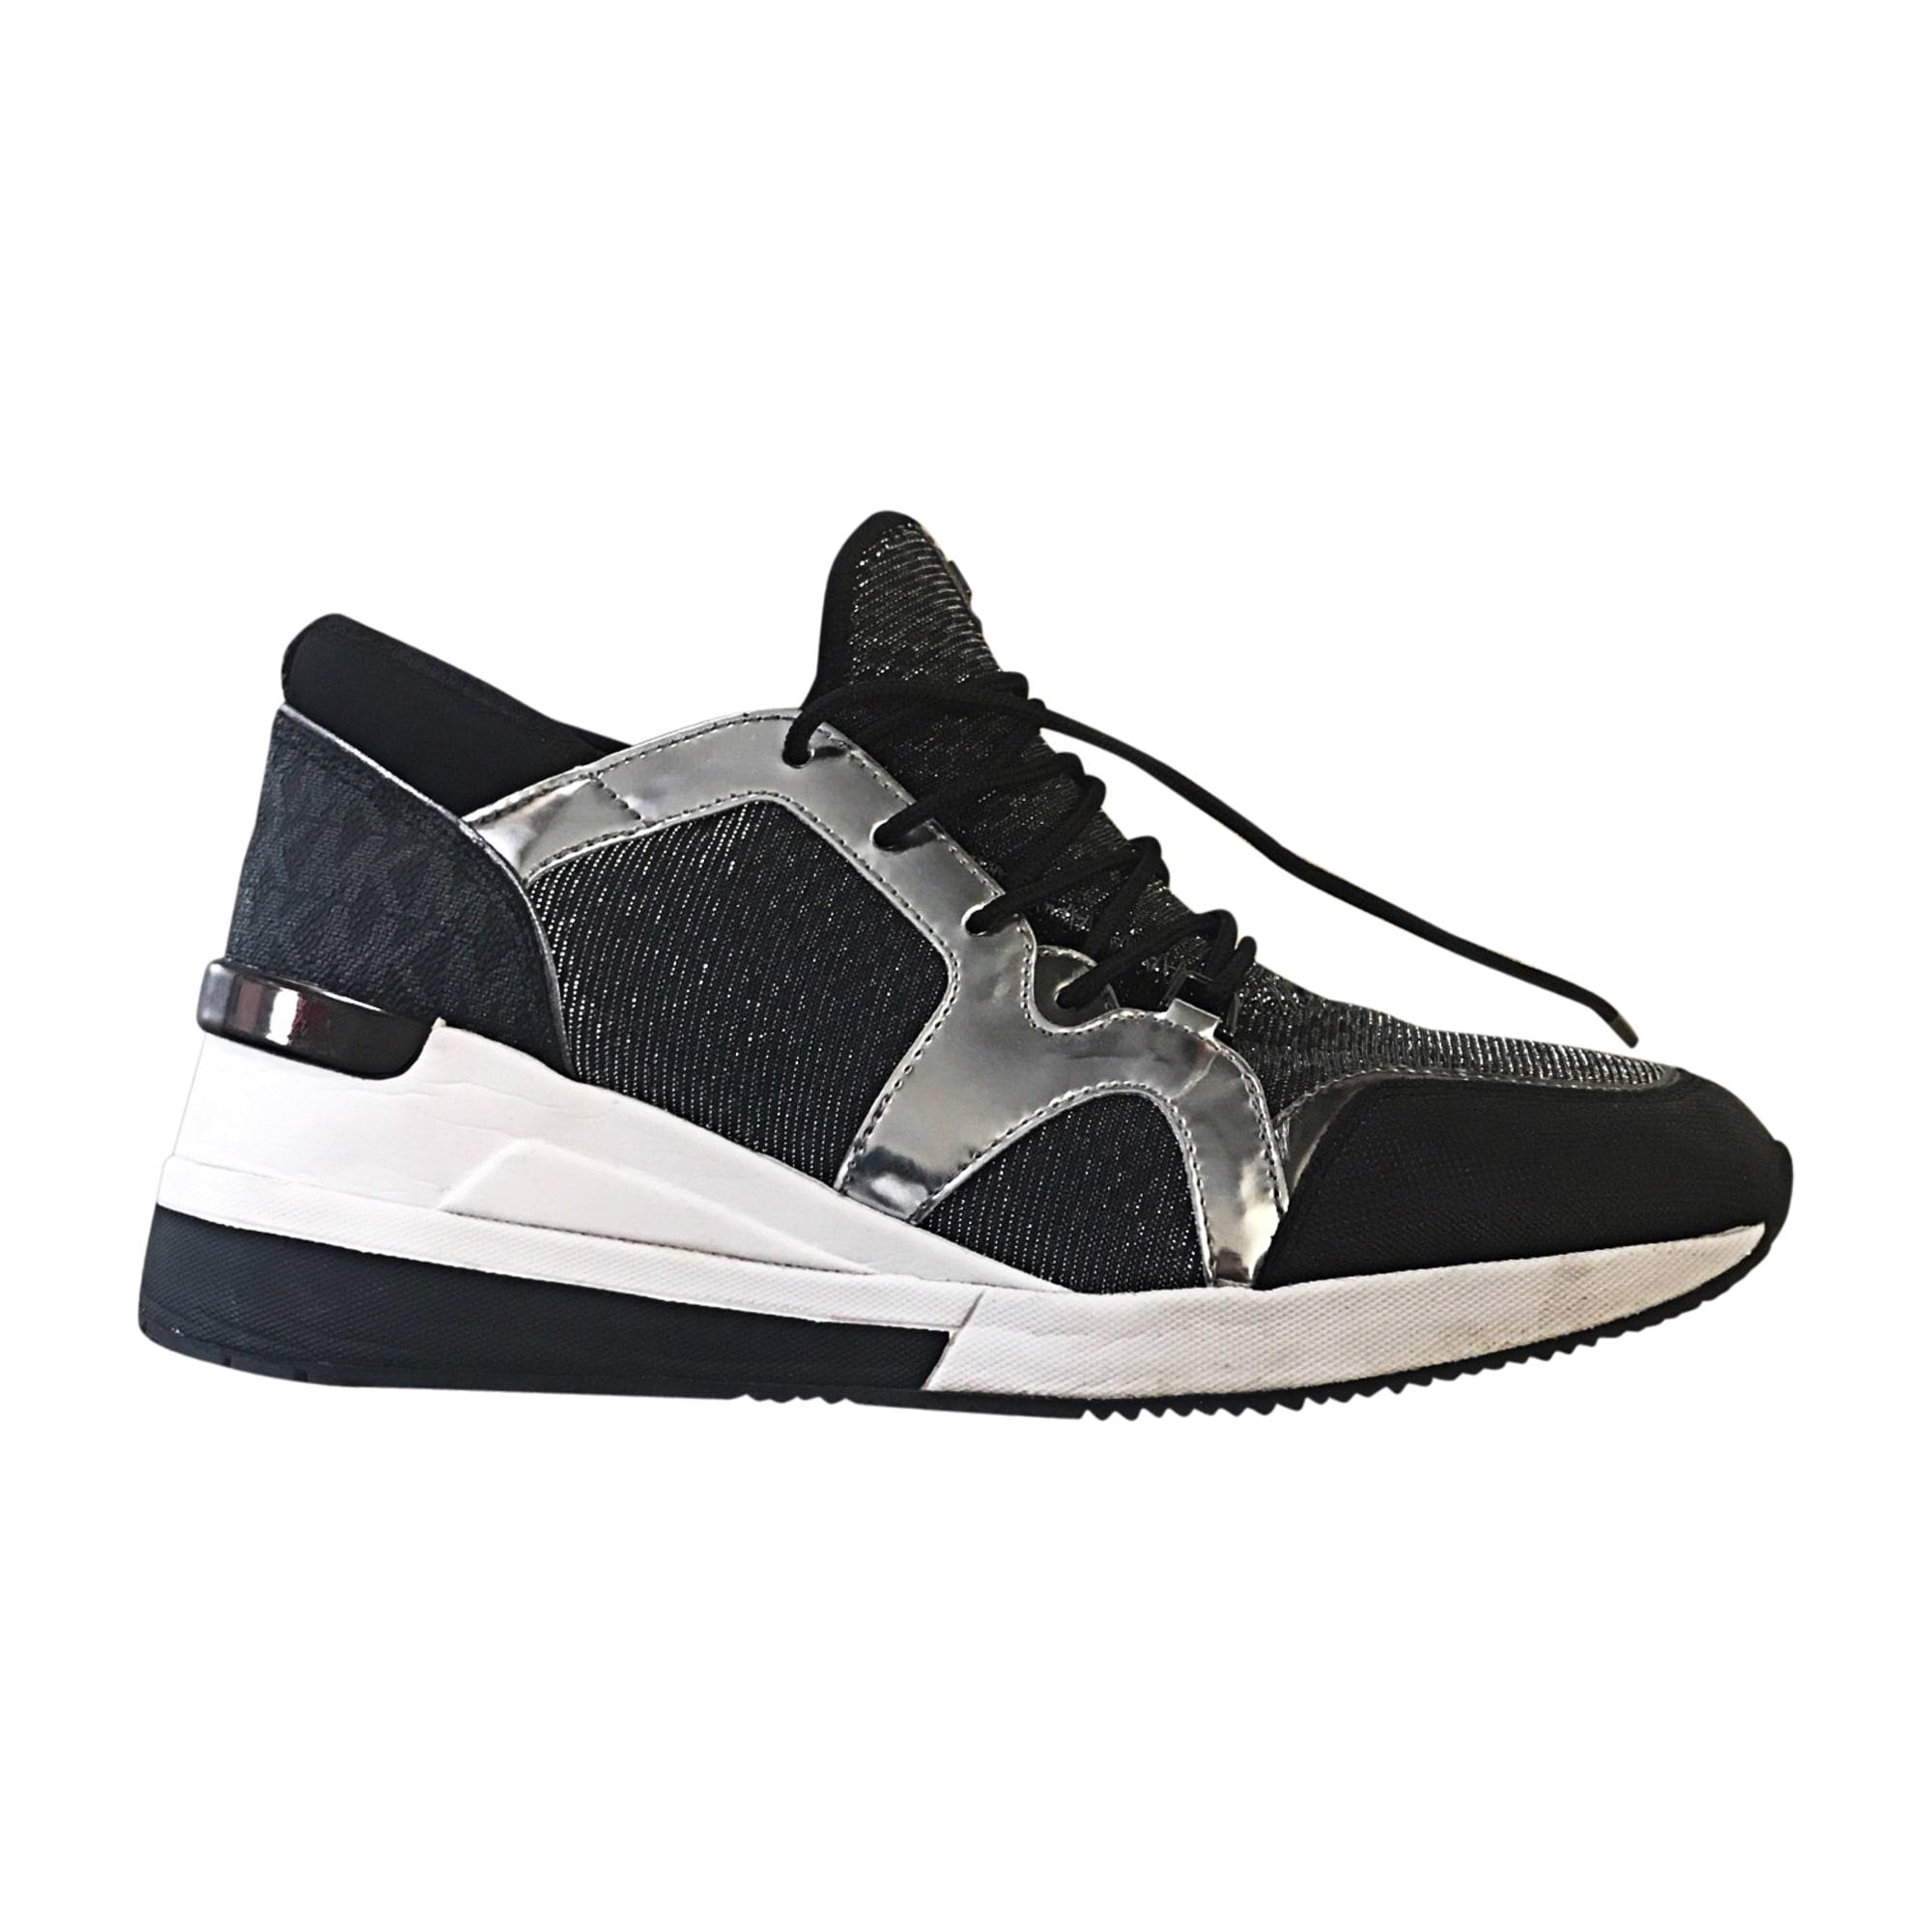 Sneakers MICHAEL KORS Silver